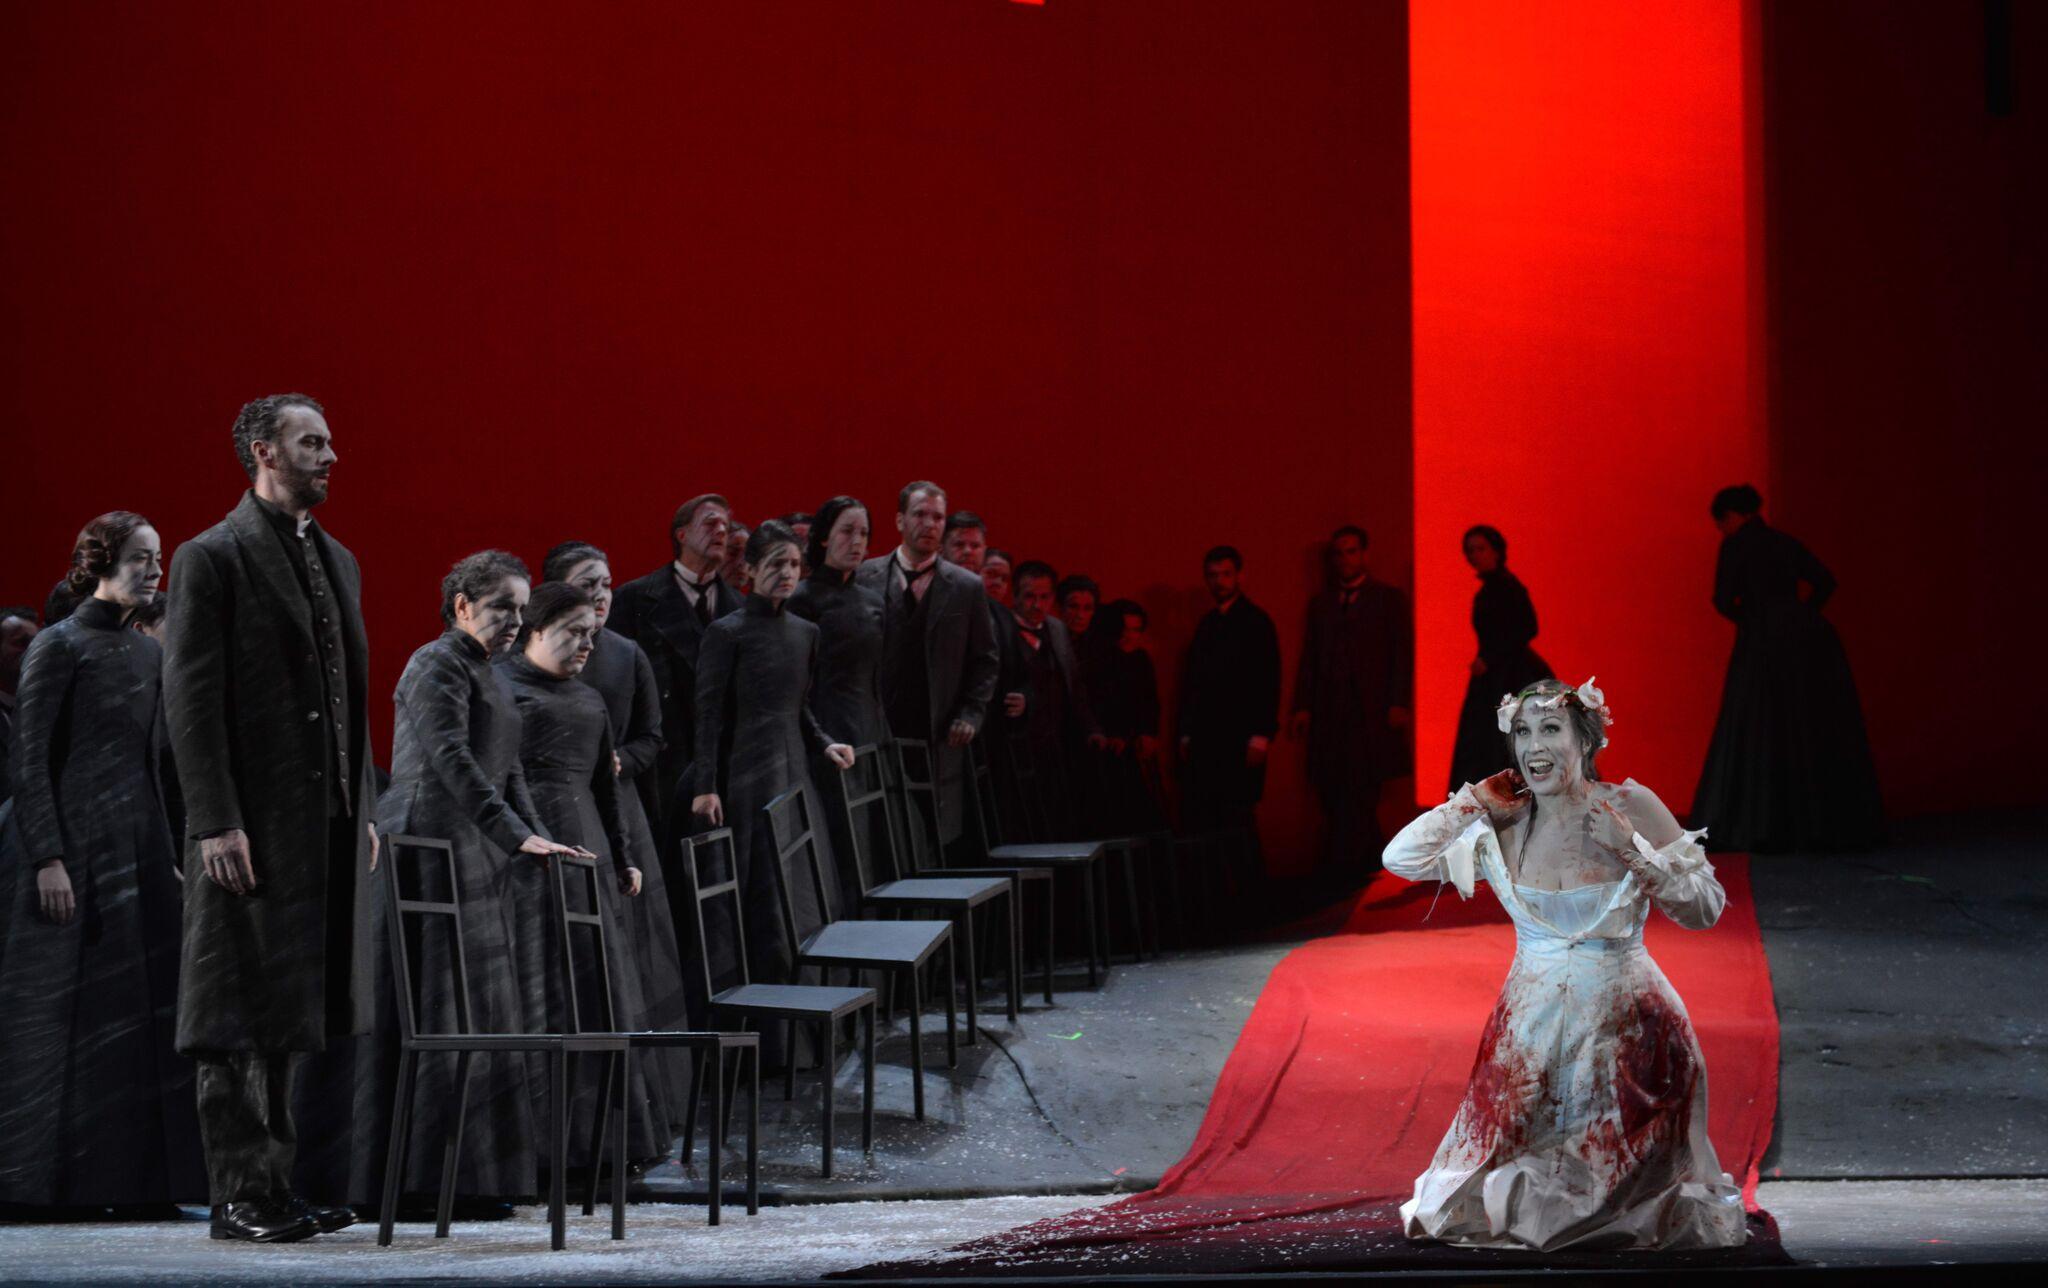 Lucia (Brenda Rae) has gone completely mad. Photo by Kelly & Massa; courtesy of Opera Philadelphia.